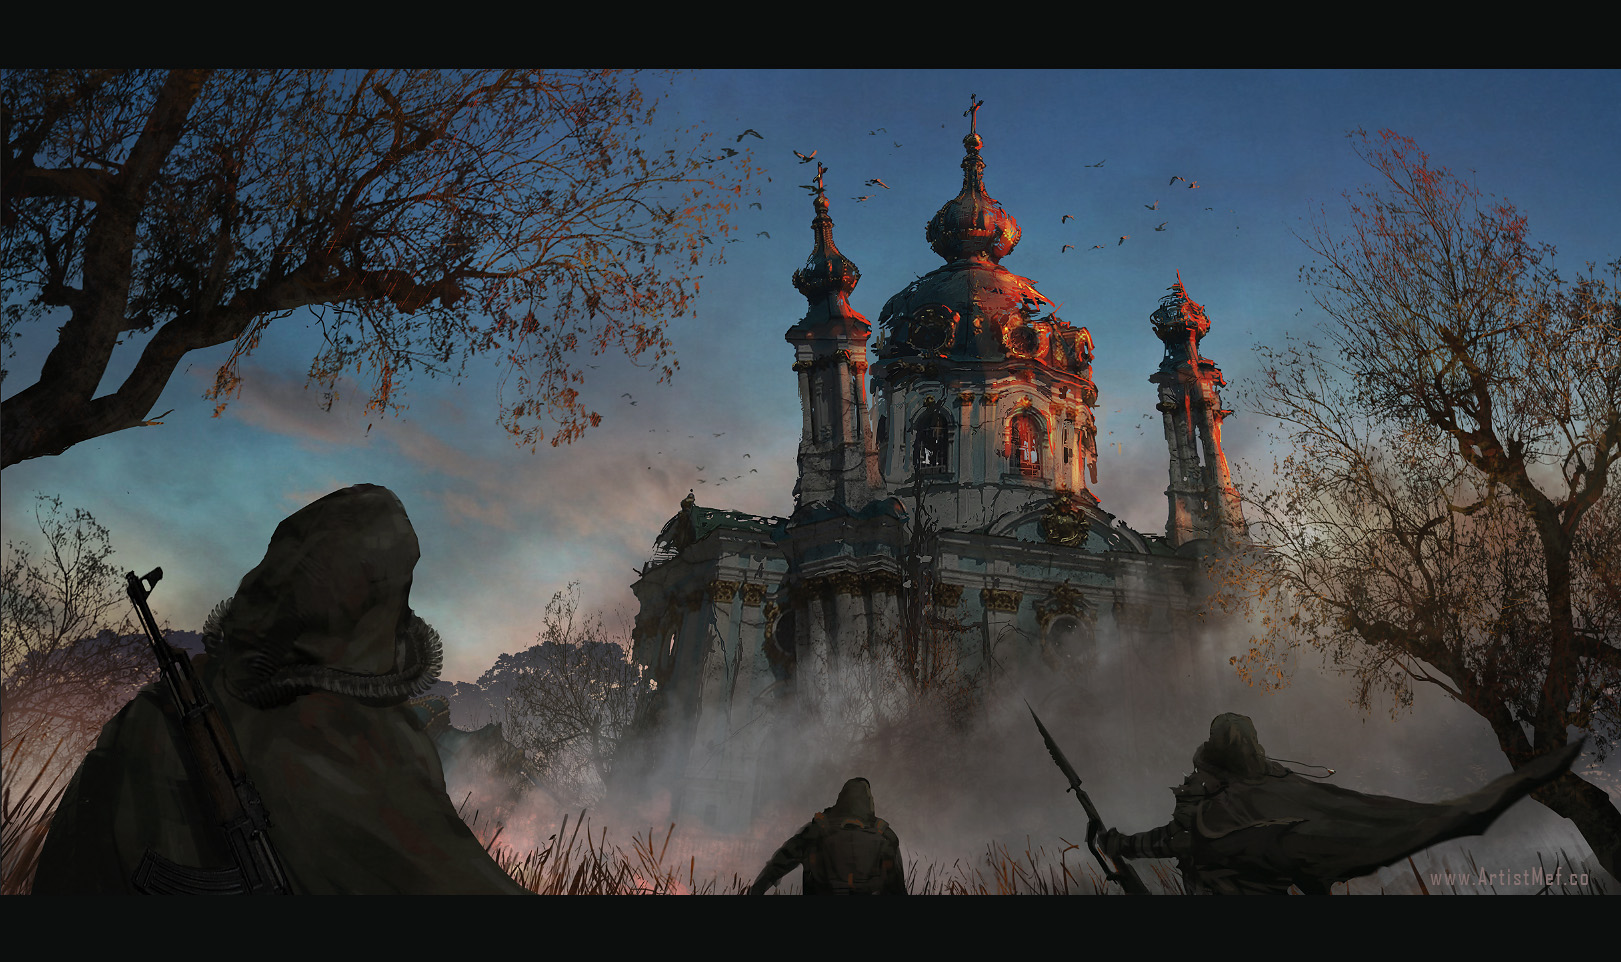 asylum by ArtistMEF